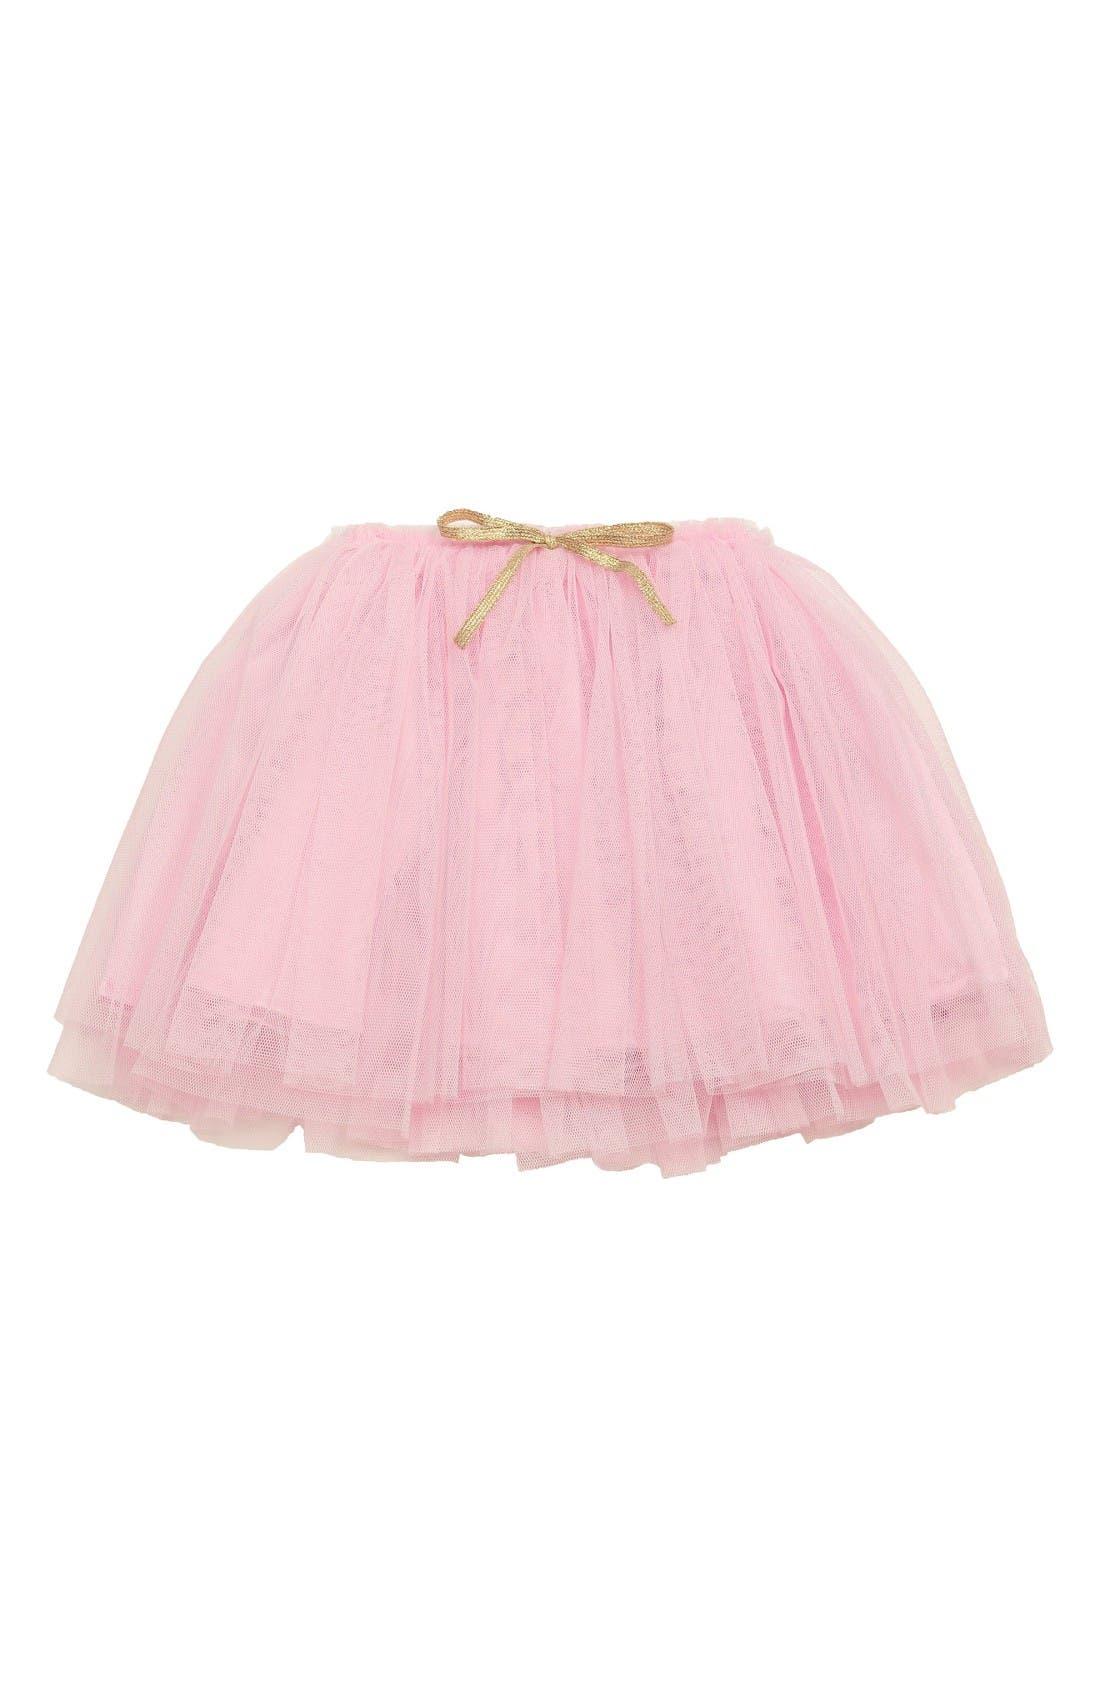 Tutu Skirt,                         Main,                         color, Pink